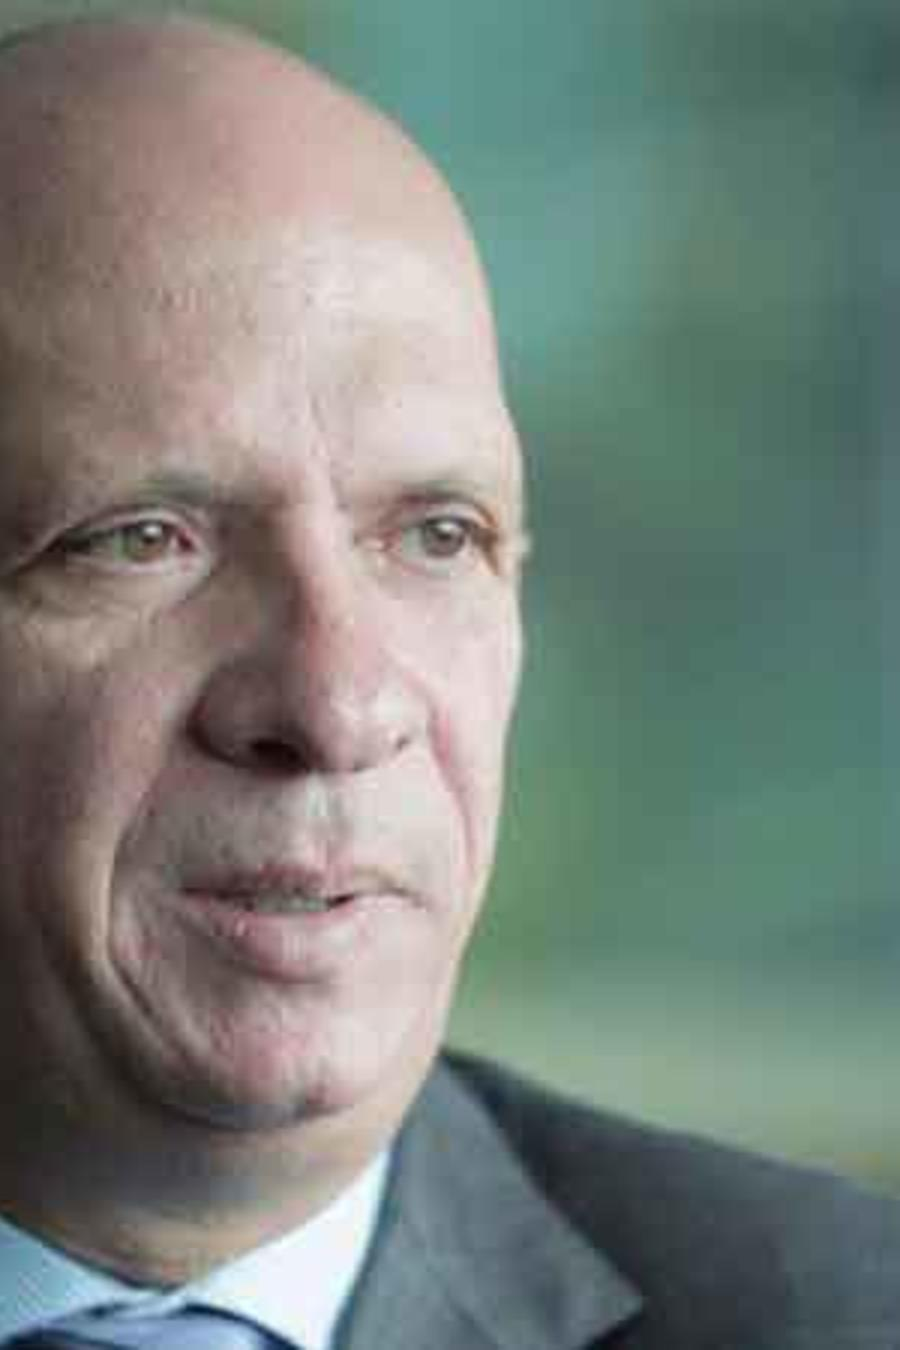 Ex jefe de contrainteligencia militar de Venezuela Hugo Carvajal